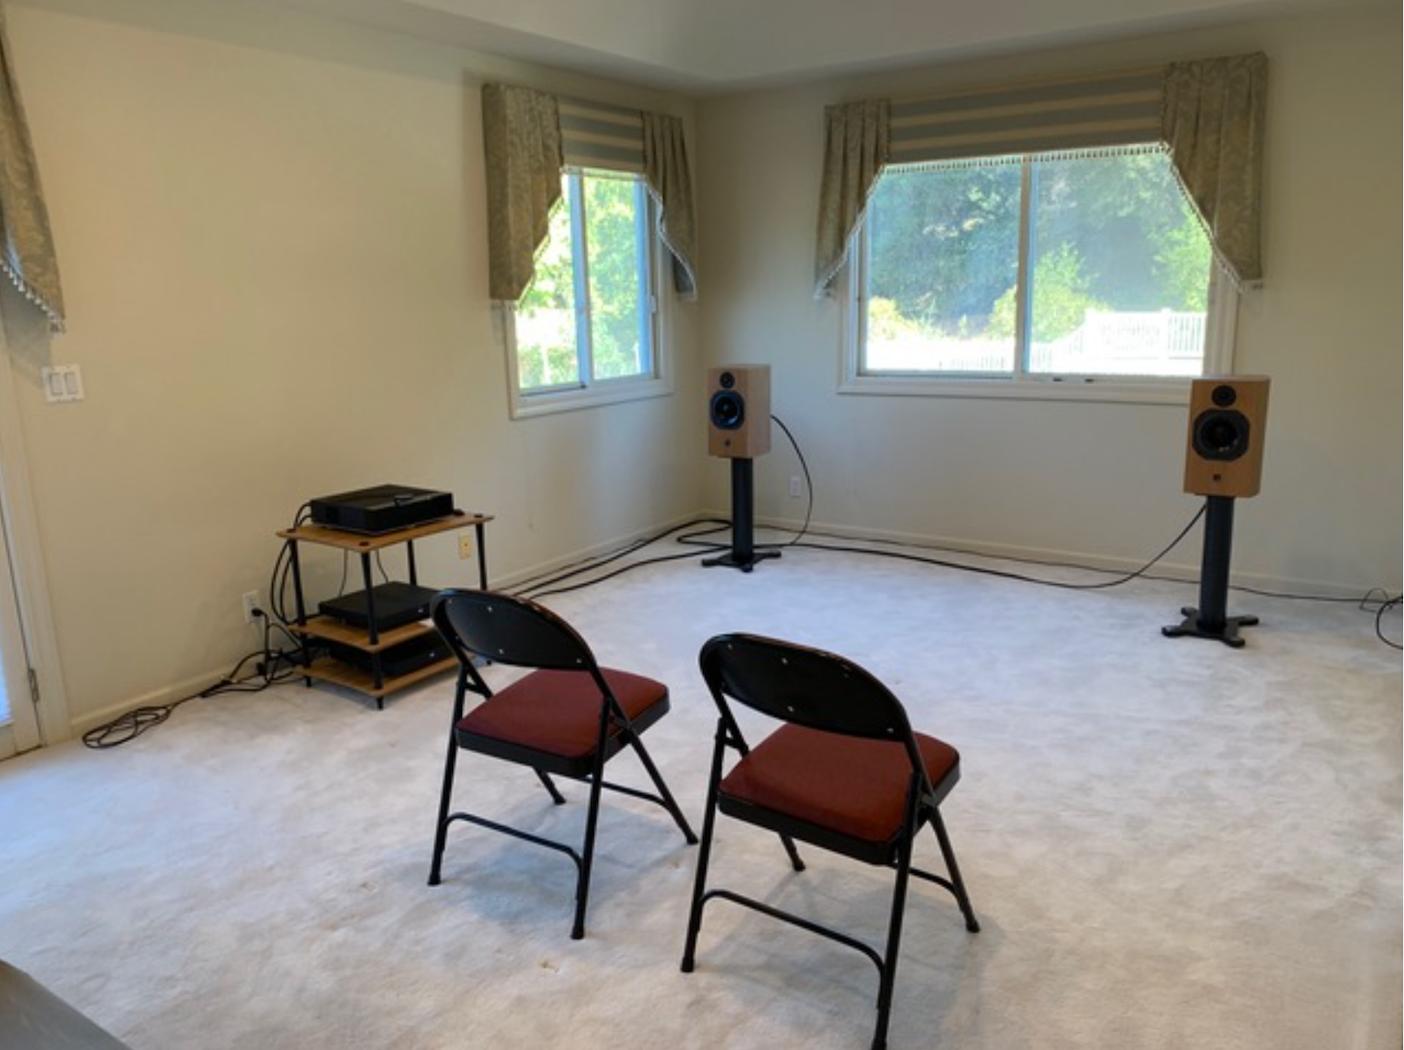 Linn, DSM, Selekt, ATC, SCM19, standmount, speakers